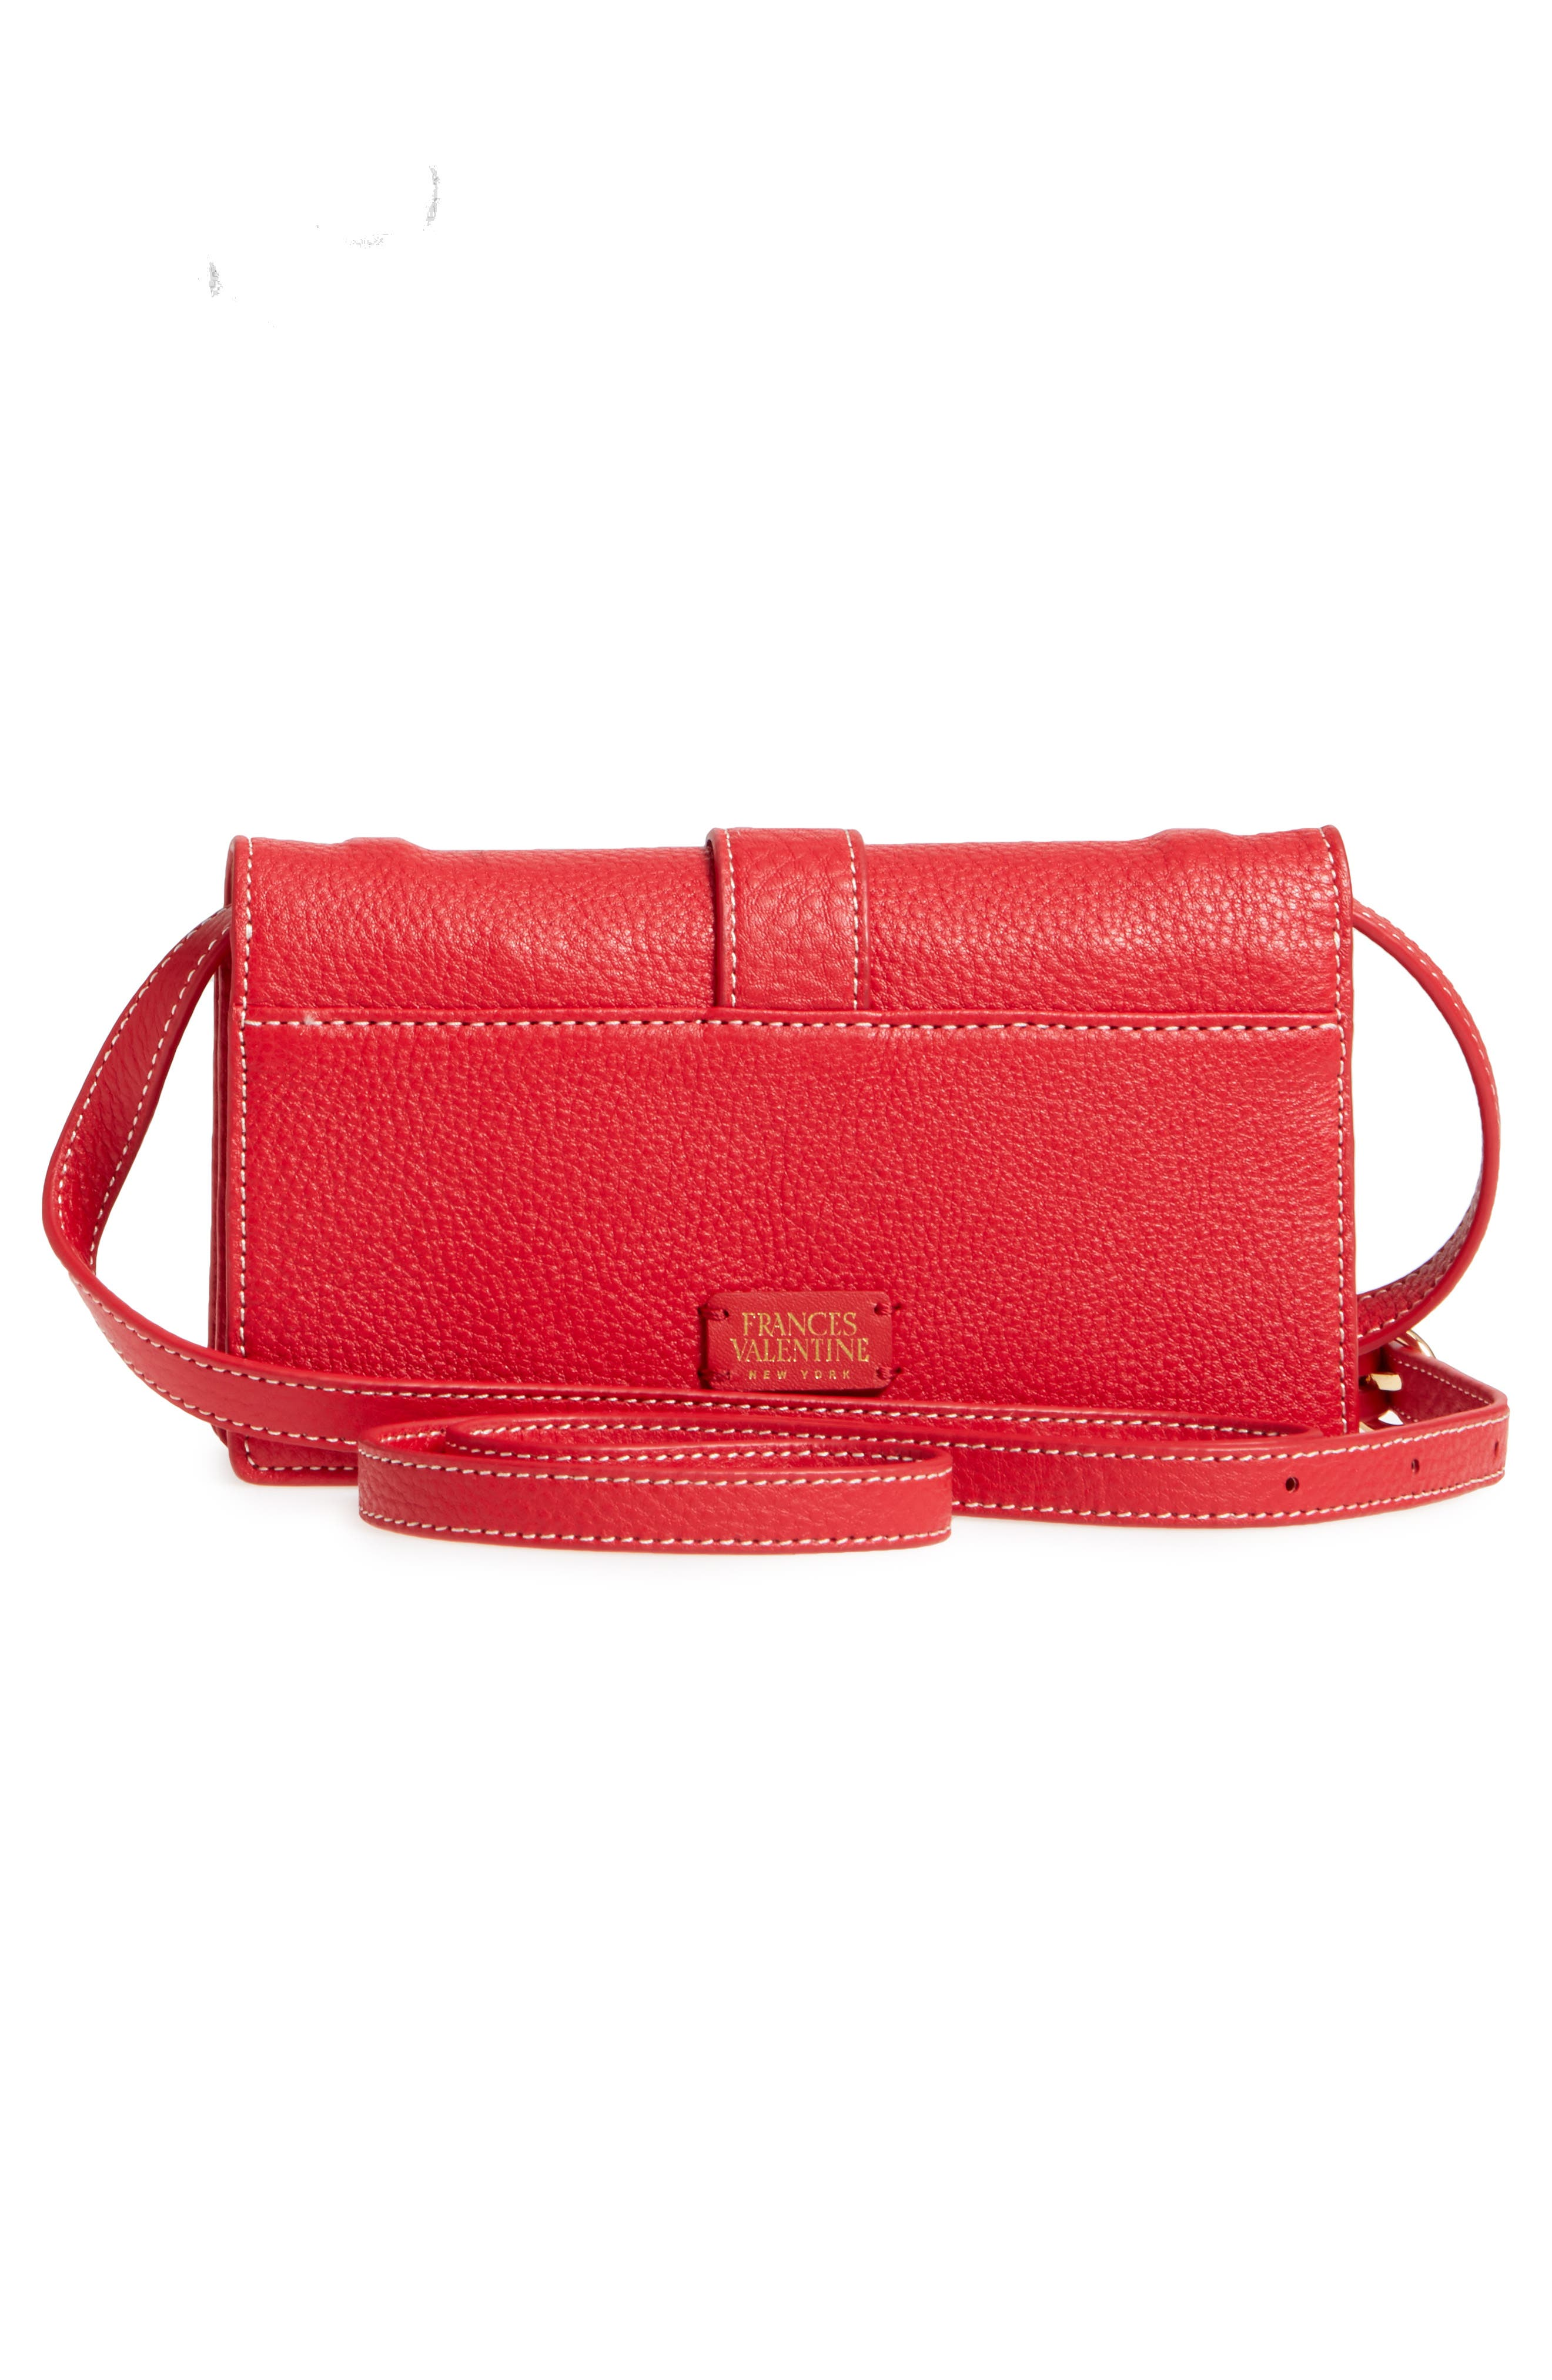 Calfskin Leather Crossbody Wallet,                             Alternate thumbnail 12, color,